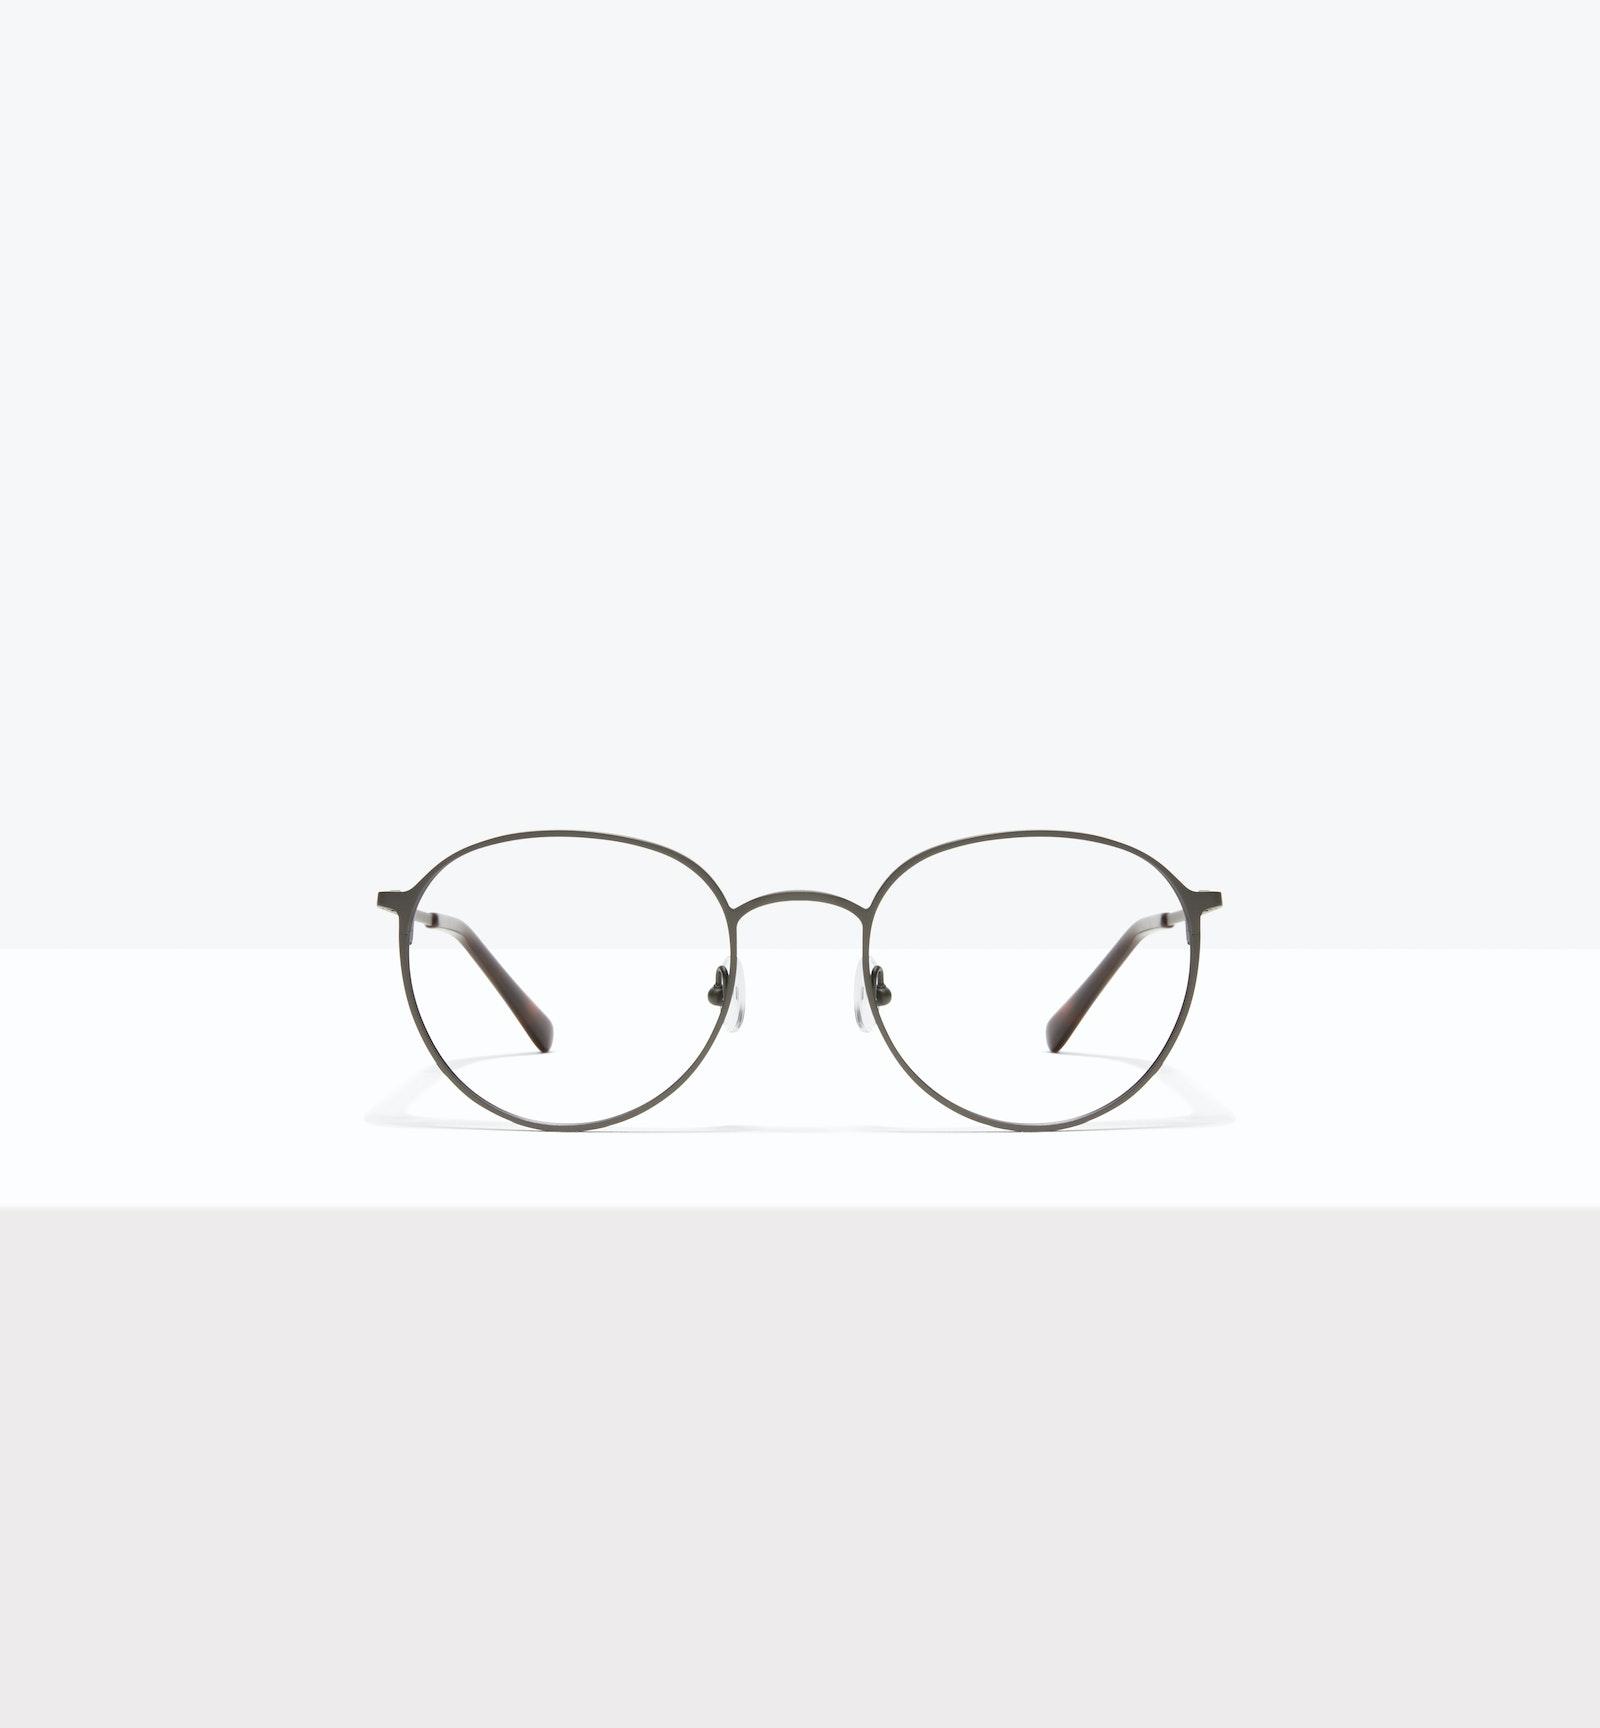 Affordable Fashion Glasses Round Eyeglasses Men Ridge Carbon